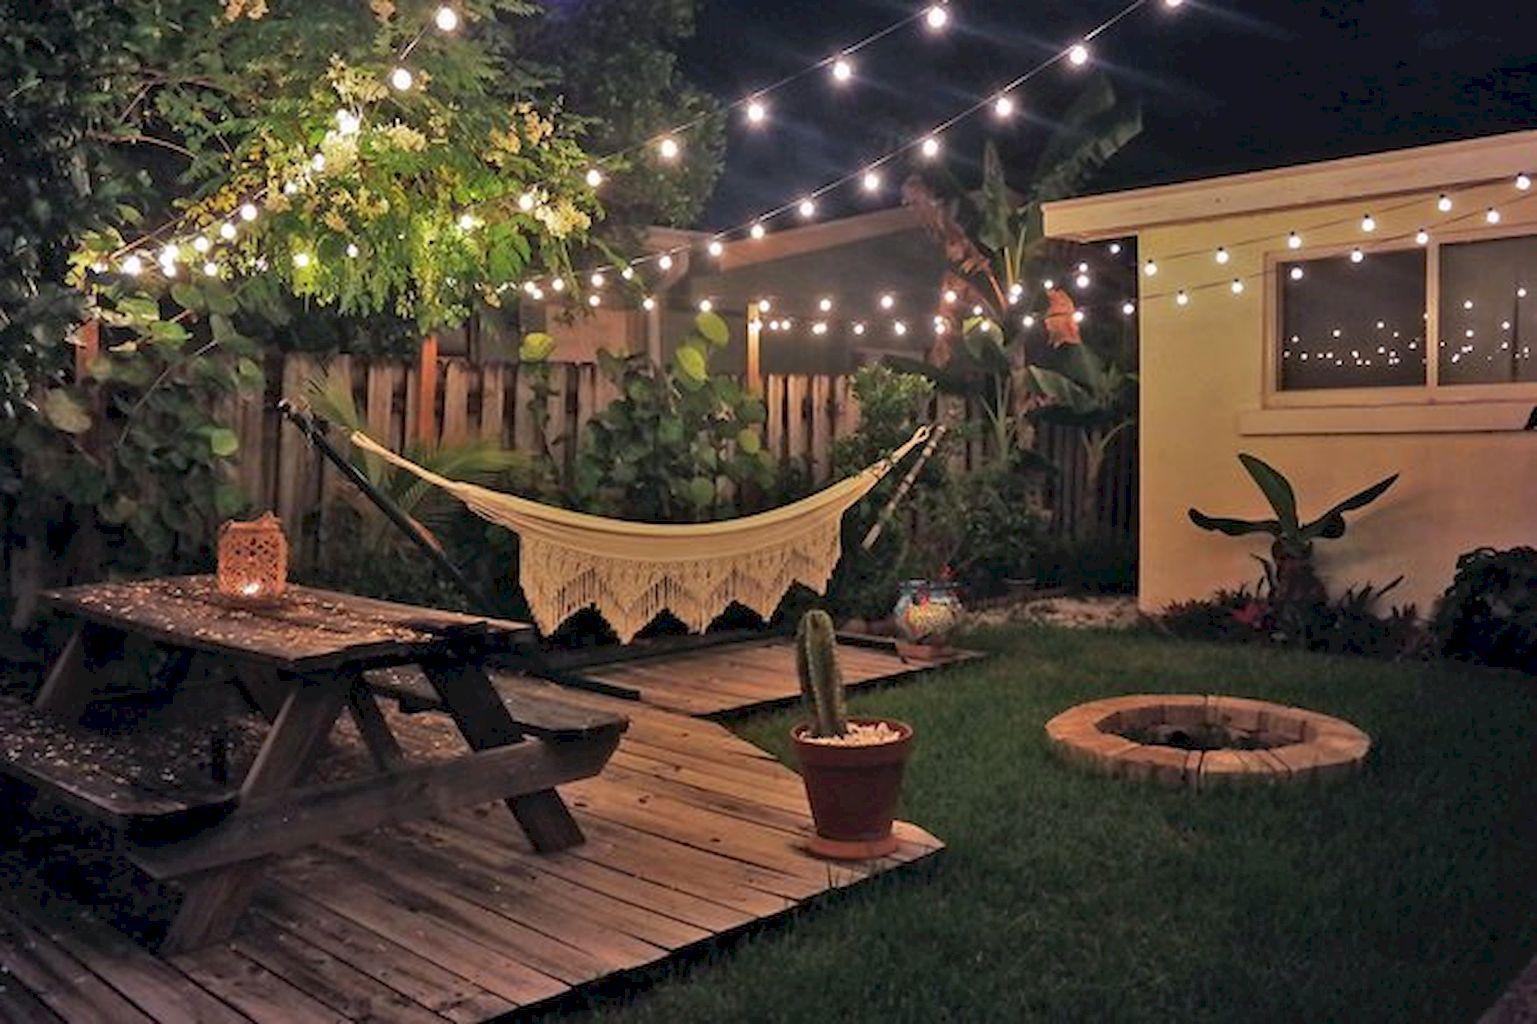 Lovable Small Backyard Deck Patio Ideas Small Backyard Decorating